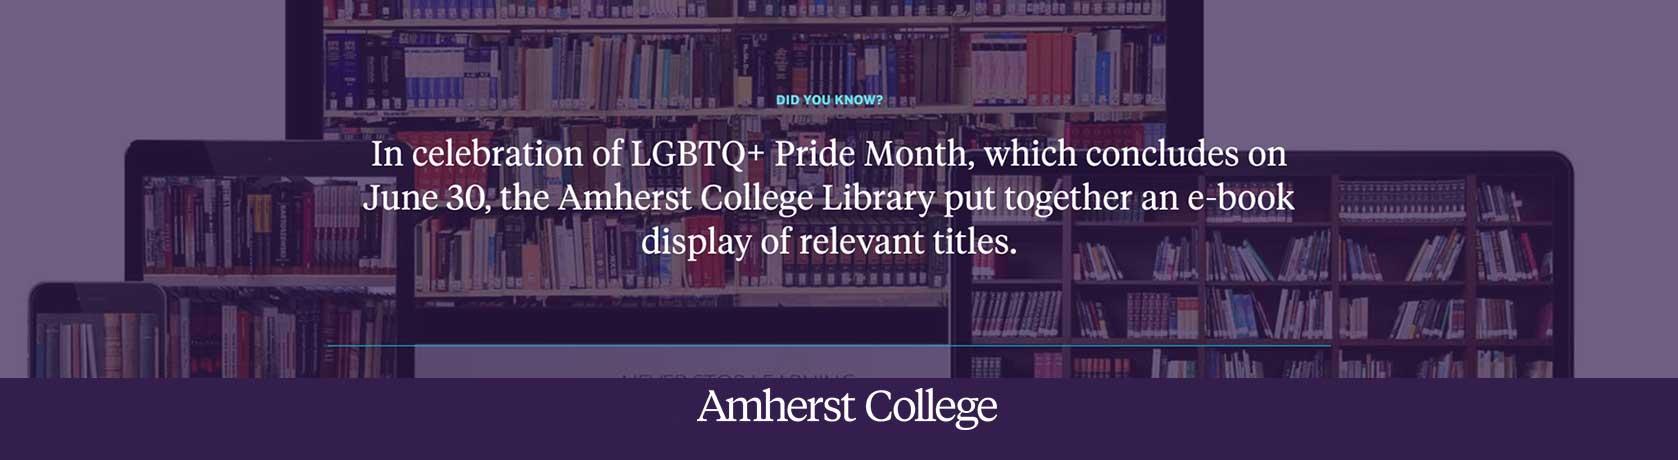 LGBTQ Digital Book Collection